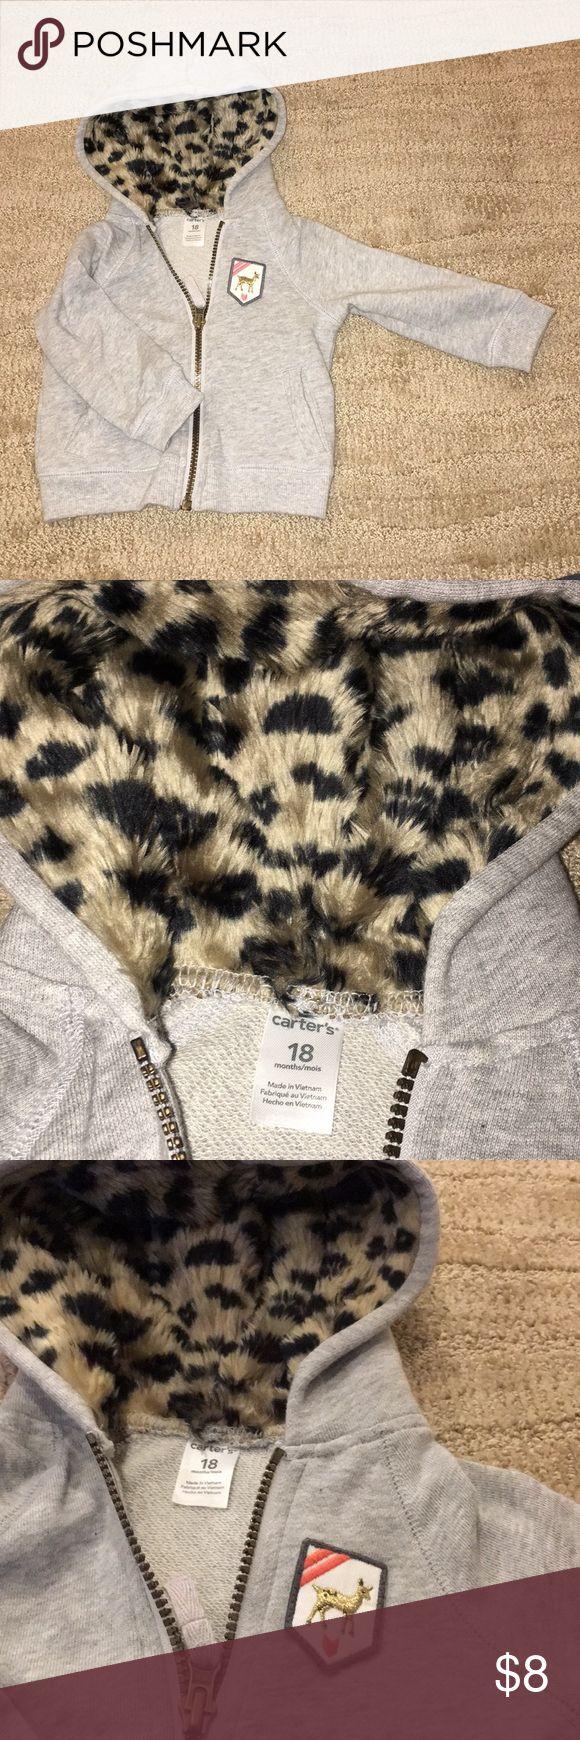 Adorable girls hoodie w/animal print faux fur hood Adorable girls hoodie w/animal print faux fur hood. Cute deer patch, zip up. Great condition Carter's Shirts & Tops Sweatshirts & Hoodies